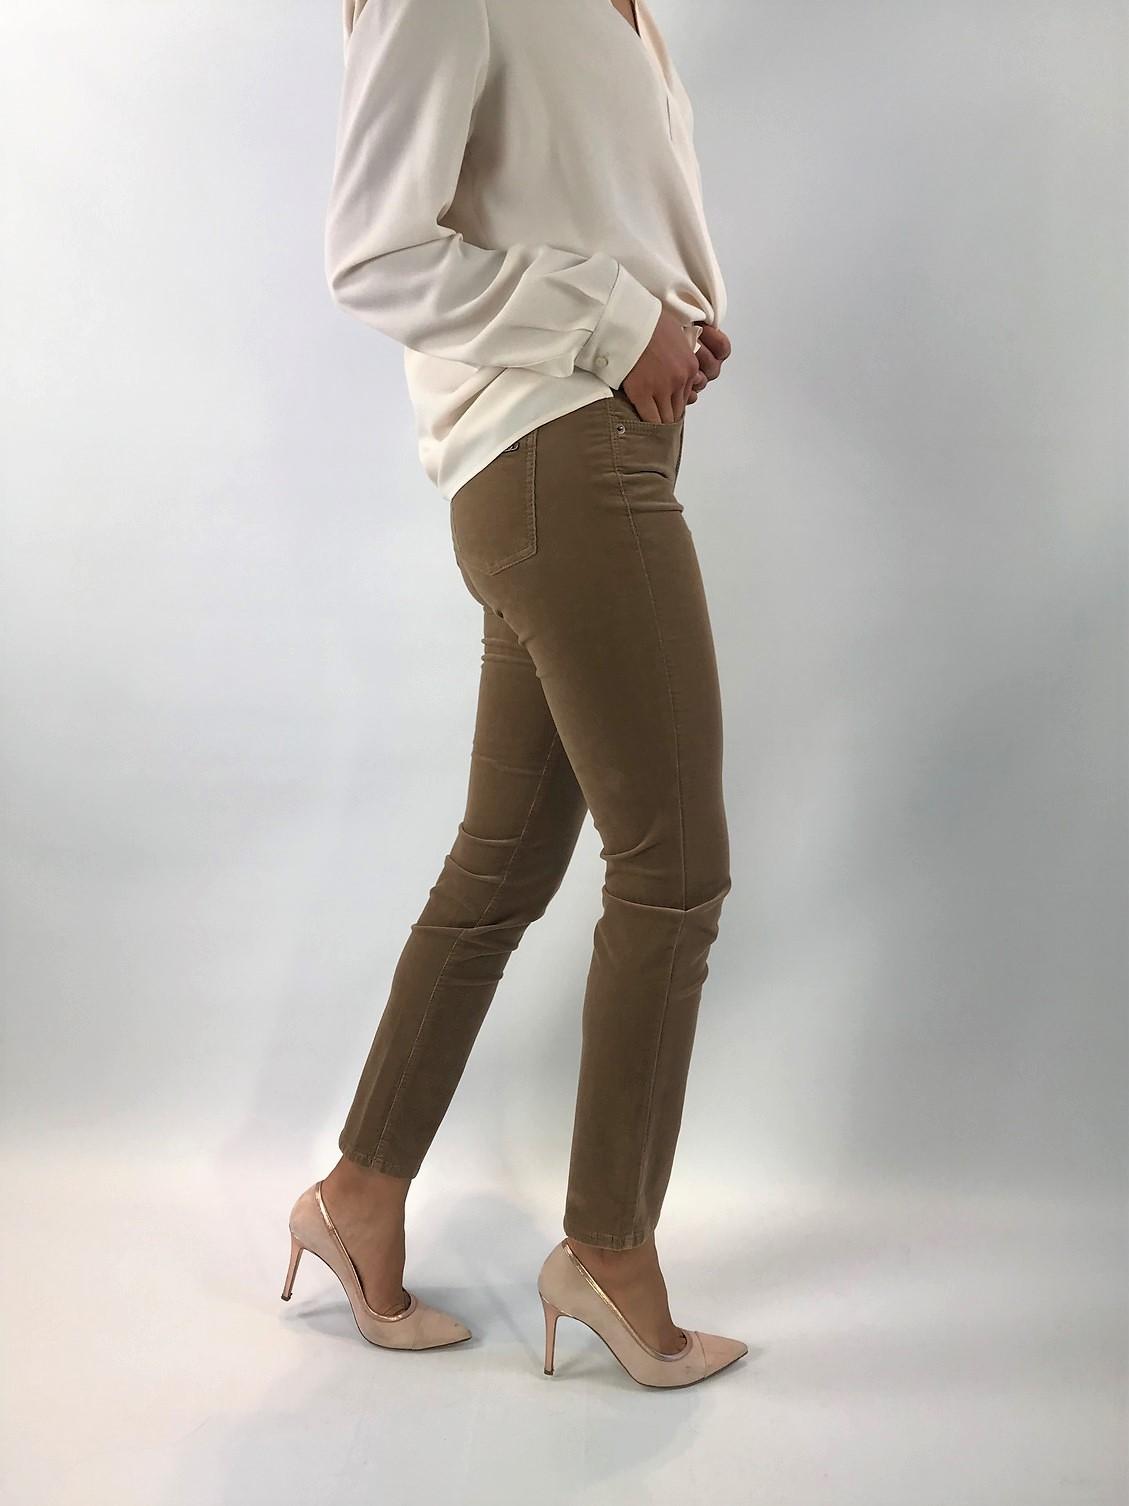 Cambio - Pina 7140 - broek velours camel